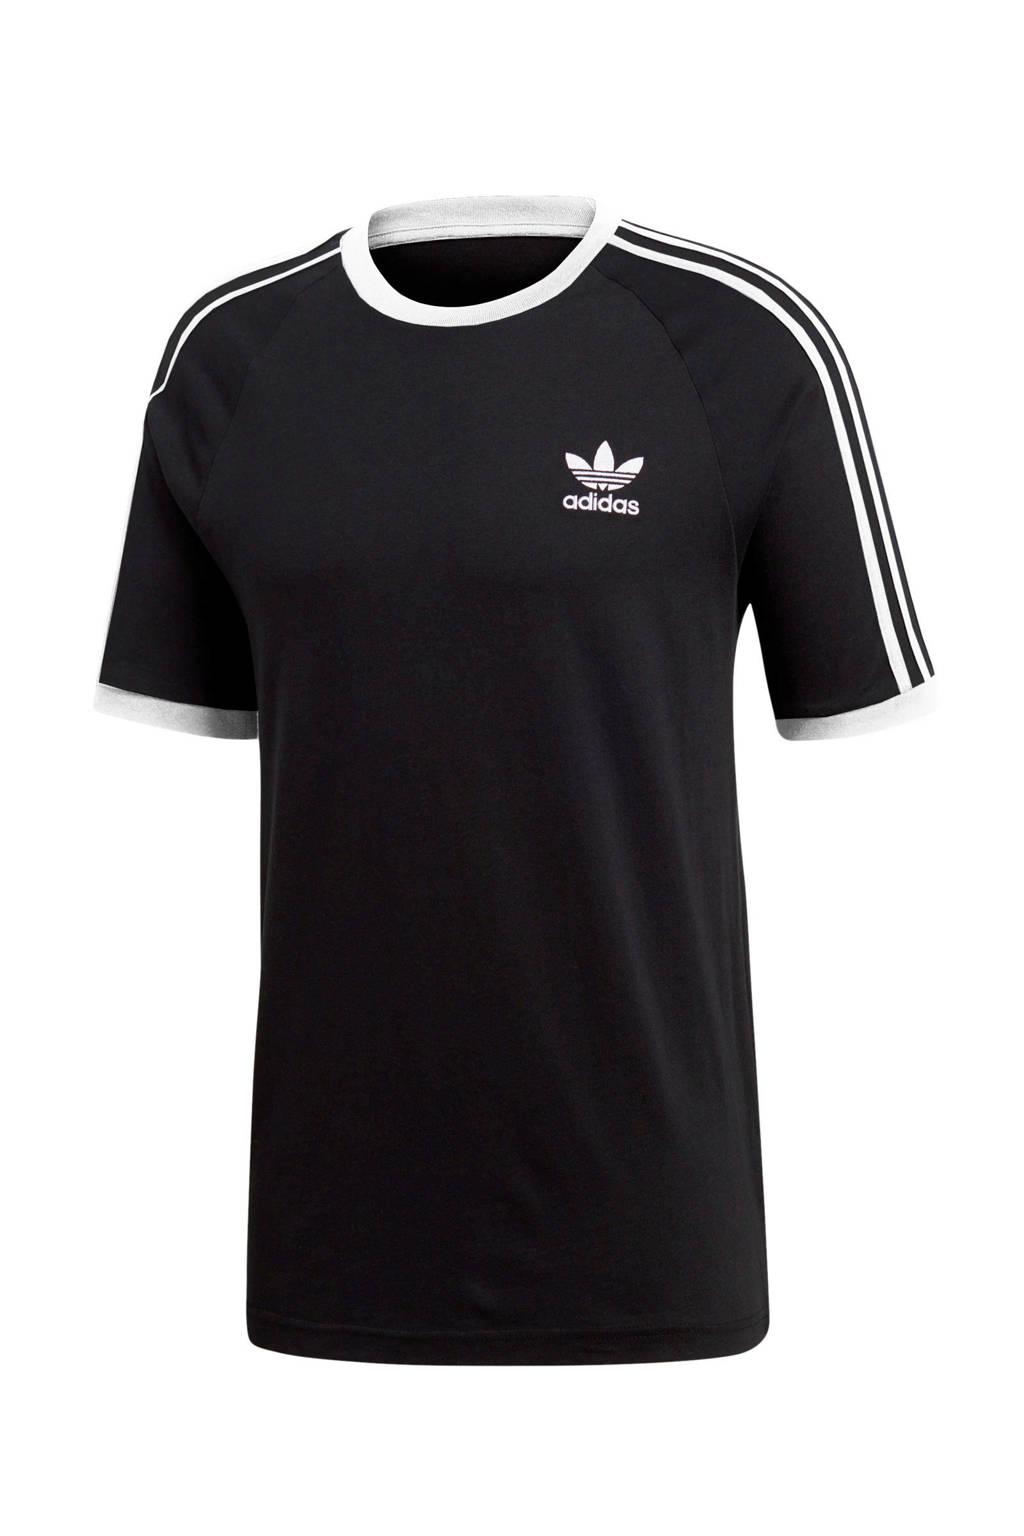 adidas Originals Adicolor T-shirt, Zwart/wit